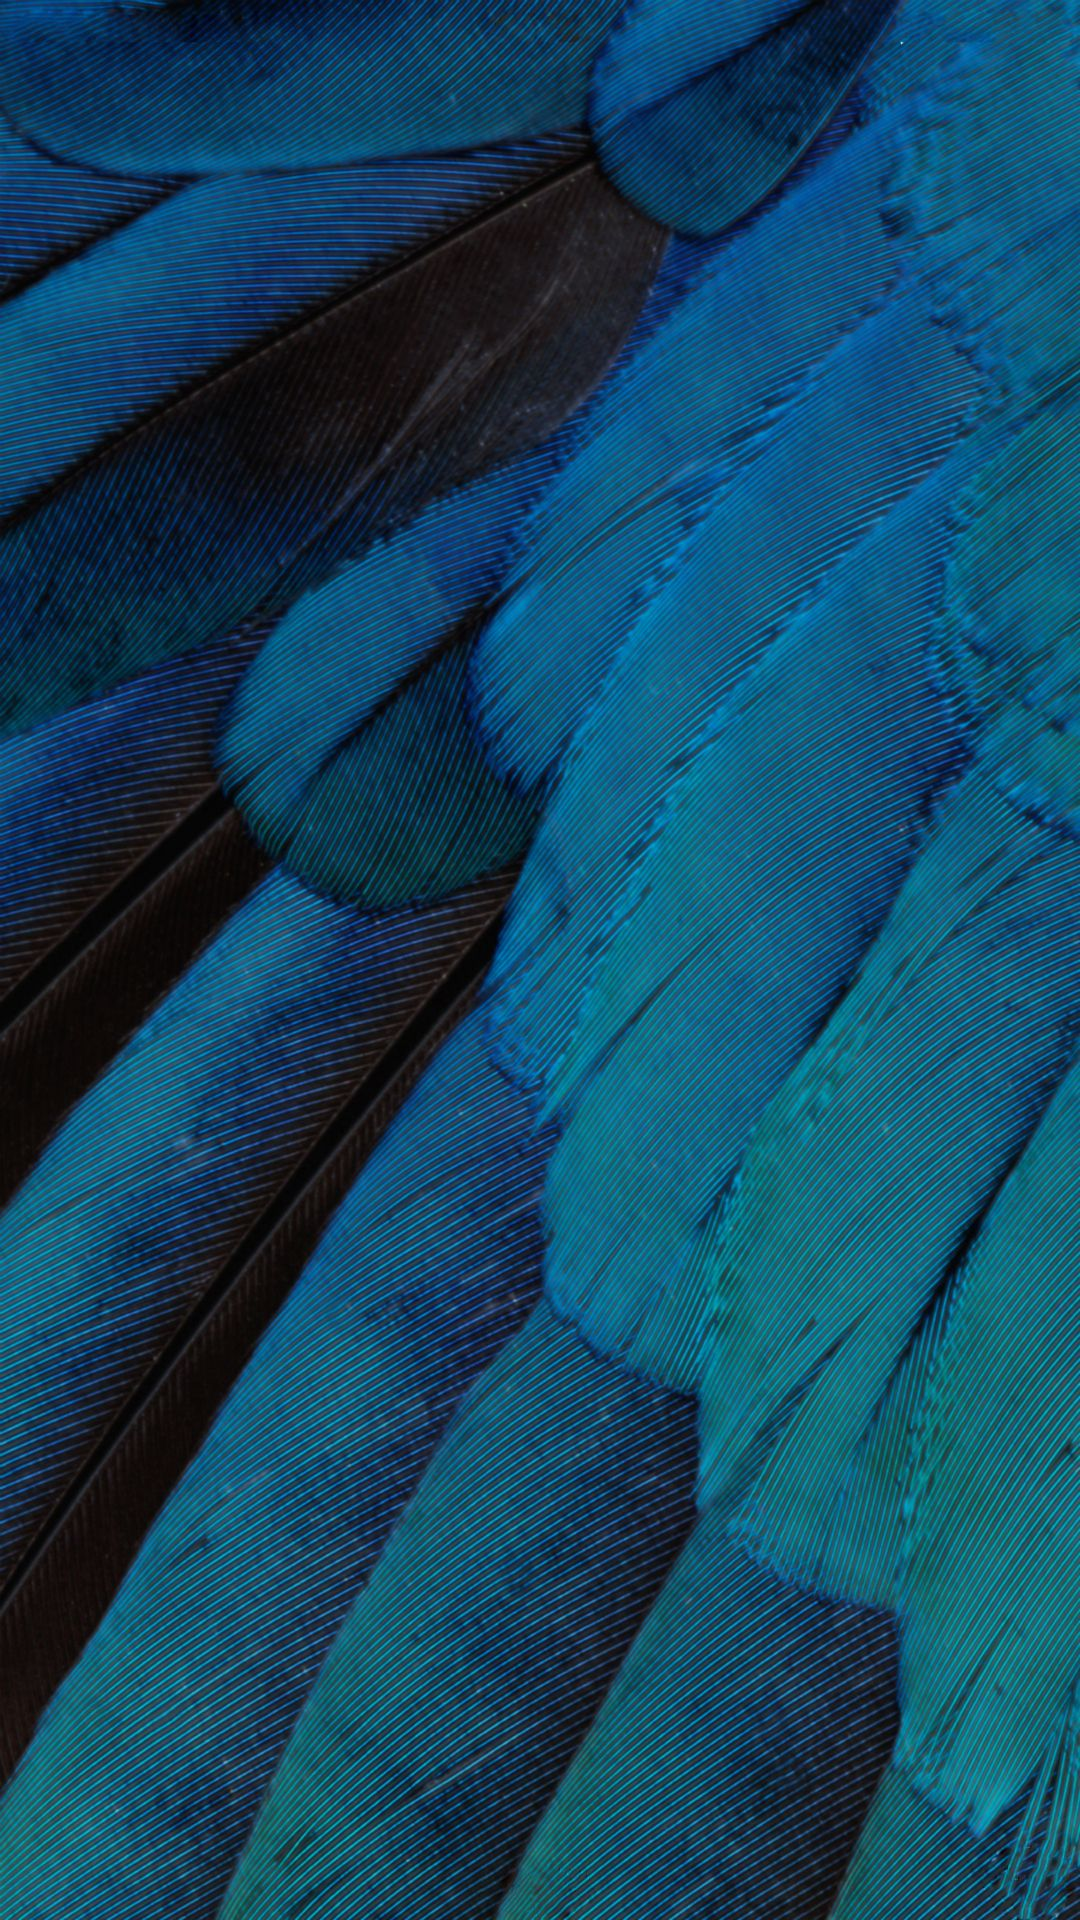 iOS9 Wallpaper Blue Feather Pattern Art iPhone 6 wallpaper 1080x1920